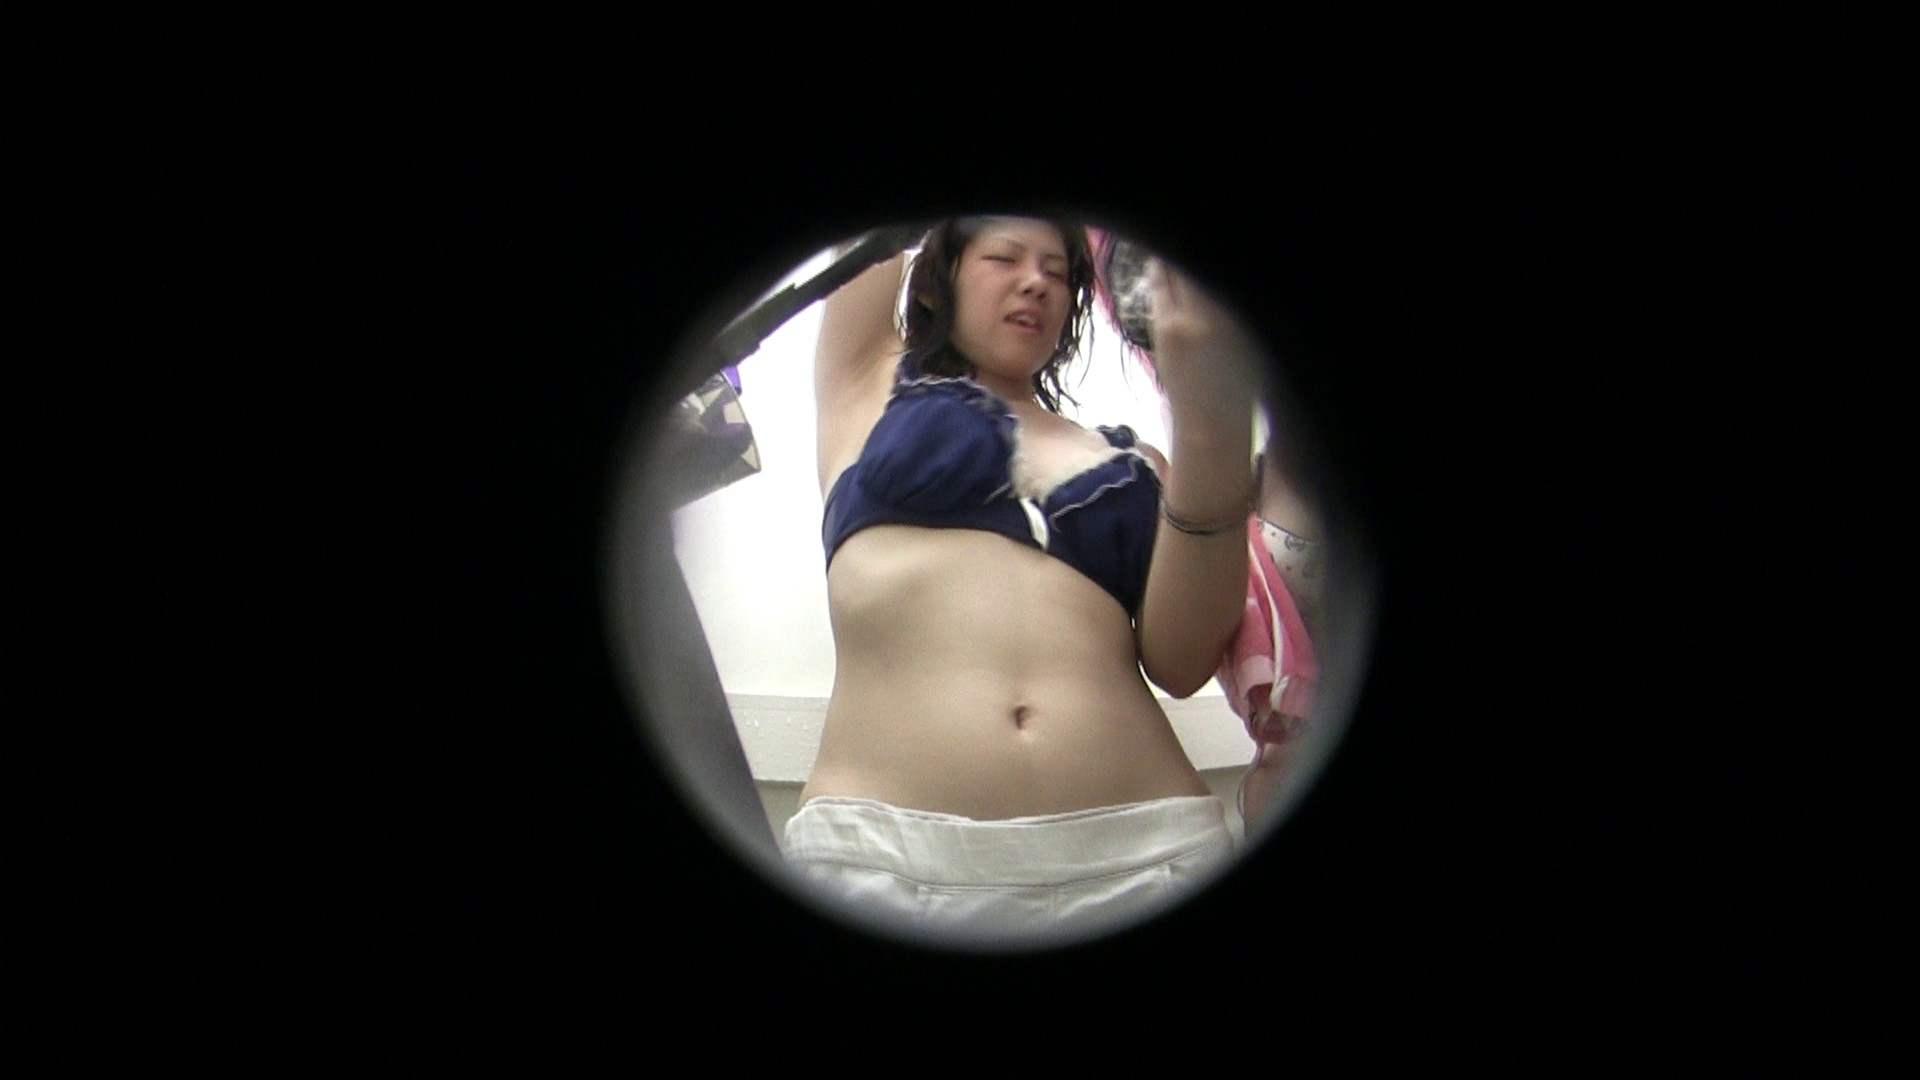 NO.23 色白巨乳嬢×2 シャワー アダルト動画キャプチャ 59枚